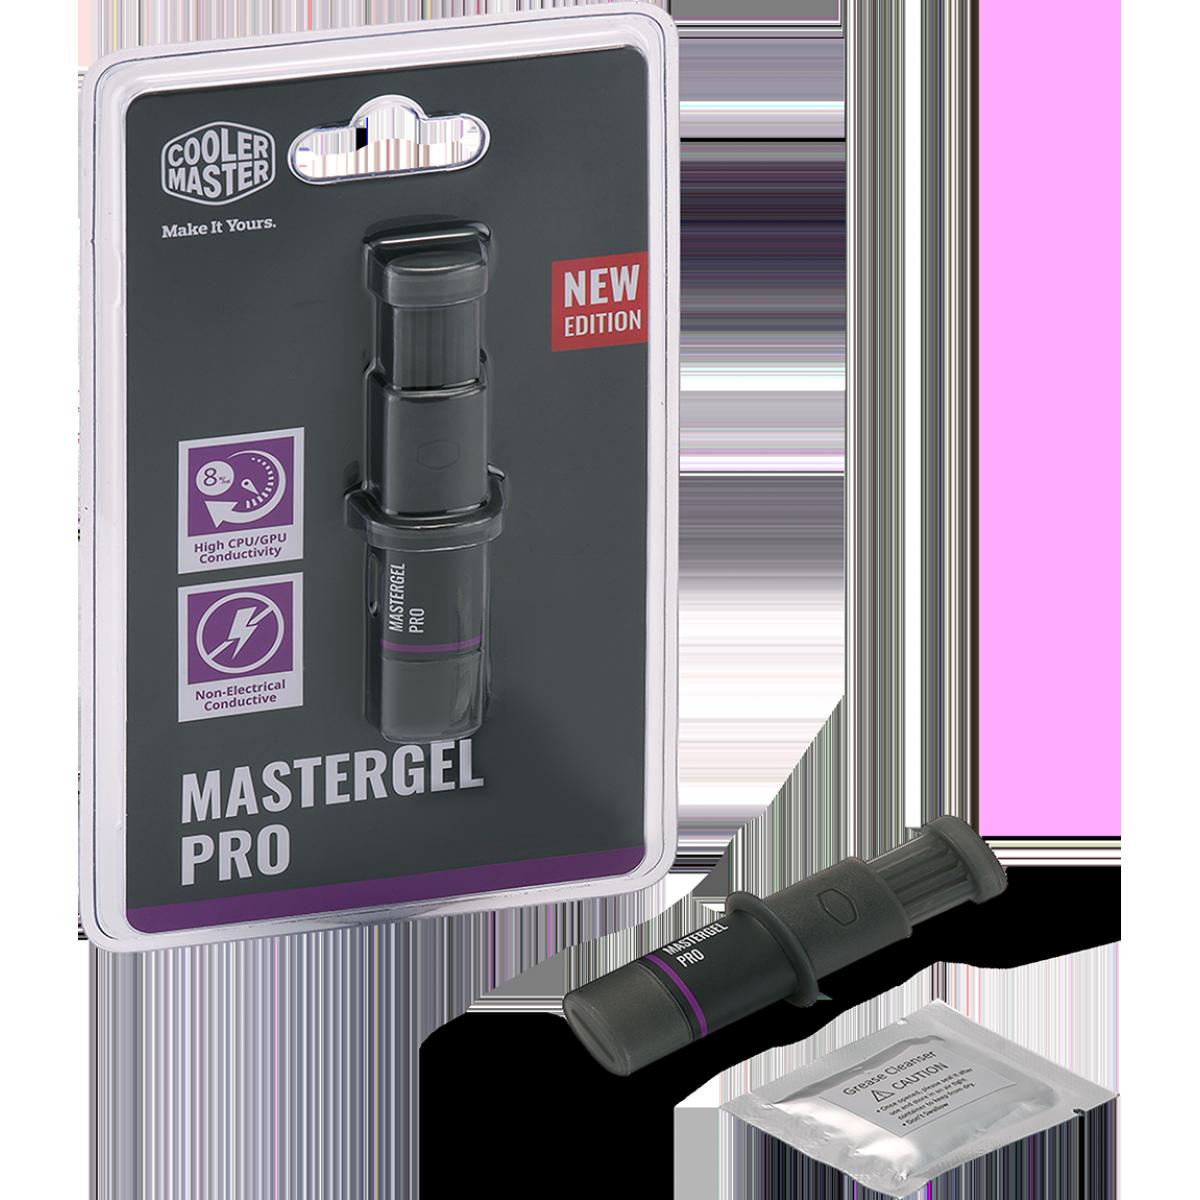 Pasta Térmica Cooler Master Mastergel Pro, MGY-ZOSG-N15M-R2